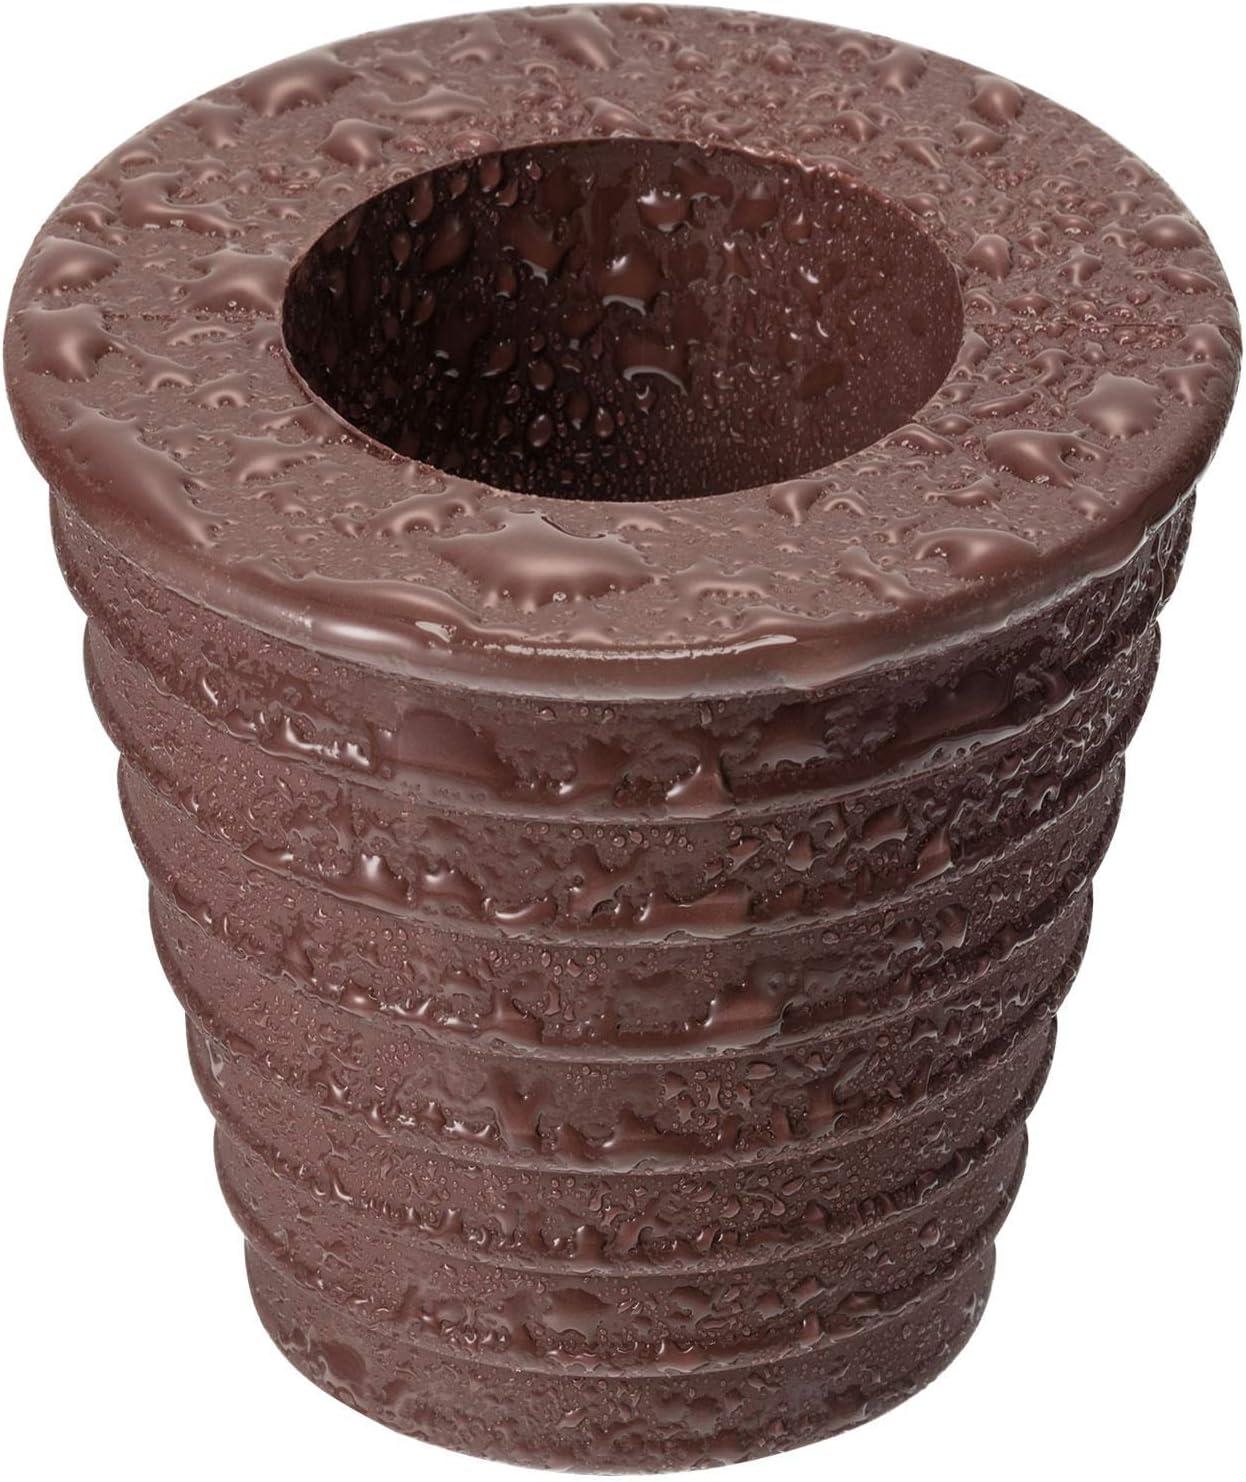 Cuña para Cono de sombrilla para Apertura de Orificio de Mesa de Patio o Base de Parasol Base 1.8 a 2.4 Pulgadas, diámetro de Poste de sombrilla 1 1/2 Pulgada / 38 mm